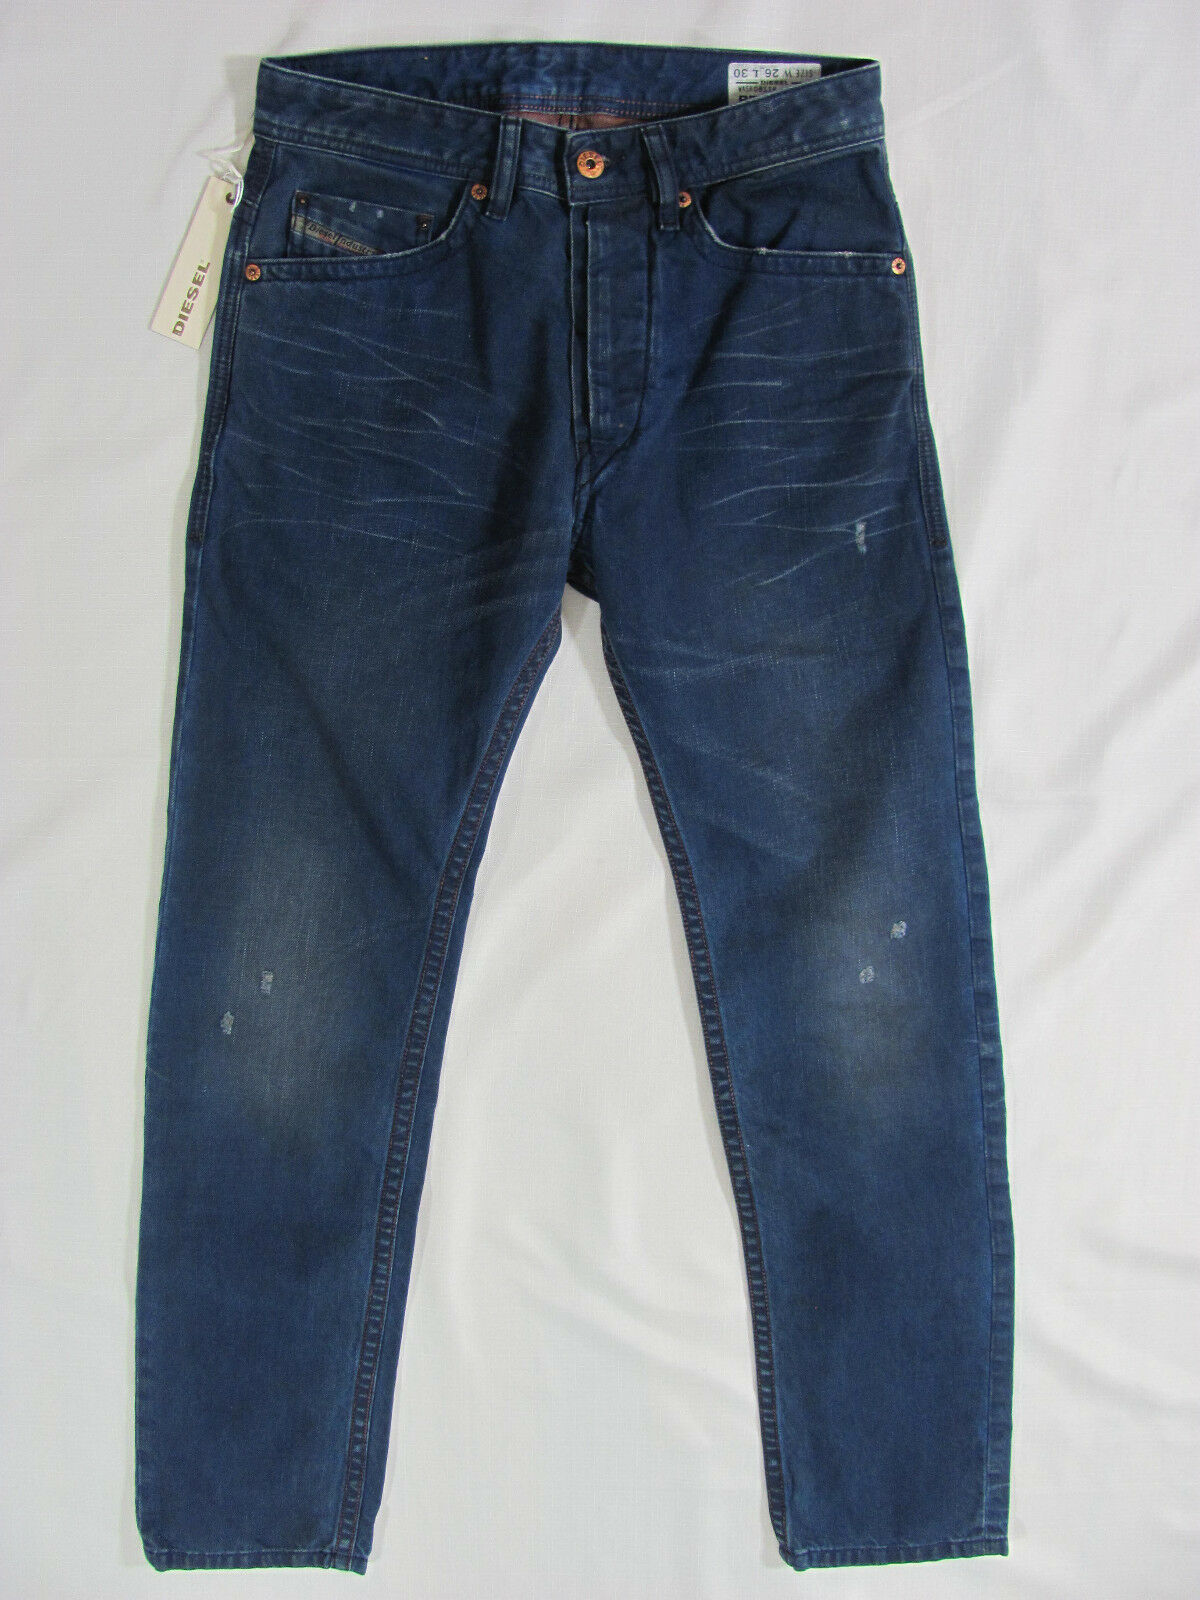 Men's Diesel Braddom Jeans-Slim Carred -Wash 0811K bluee -Size 26 New